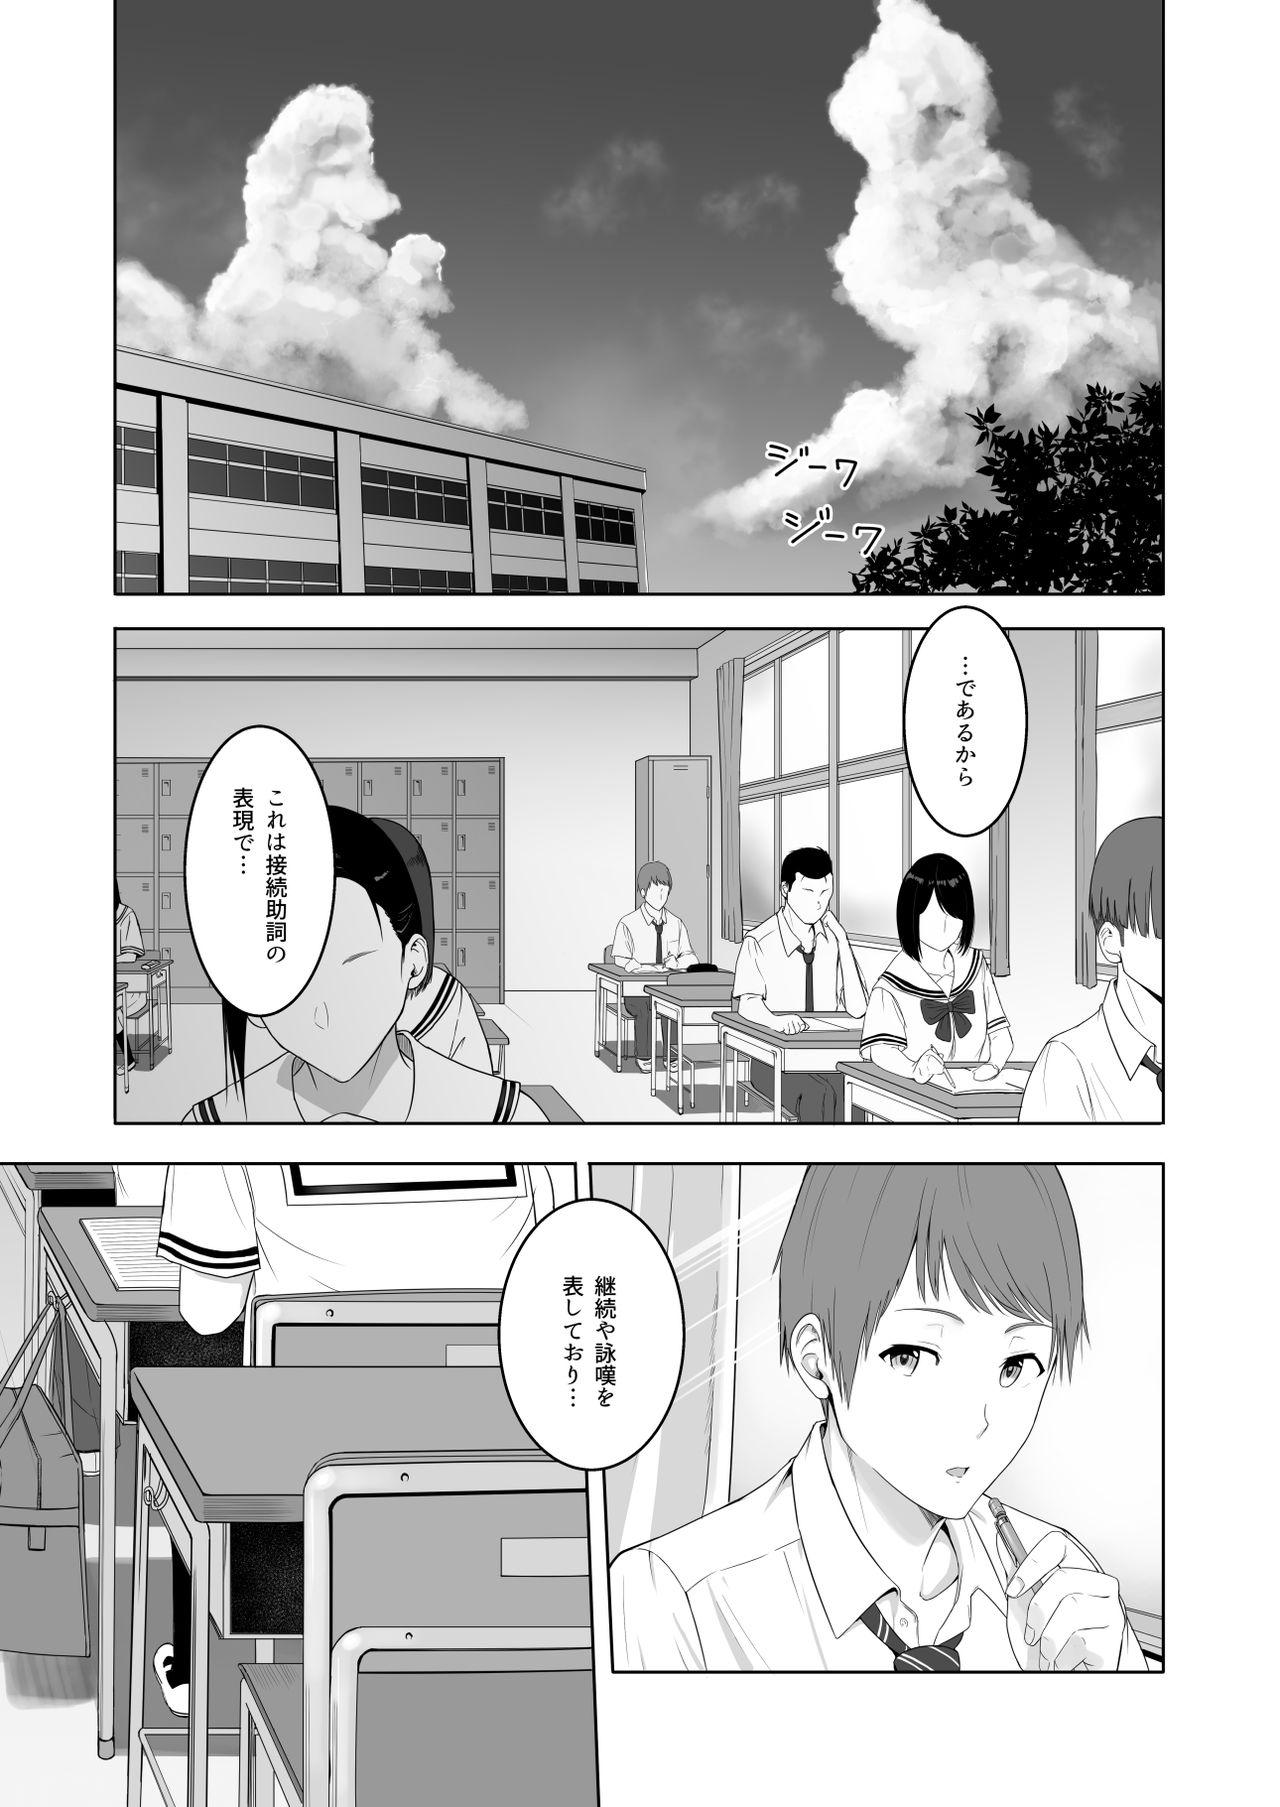 Kimi ga Tame. 2 Ichikawa Inori 3